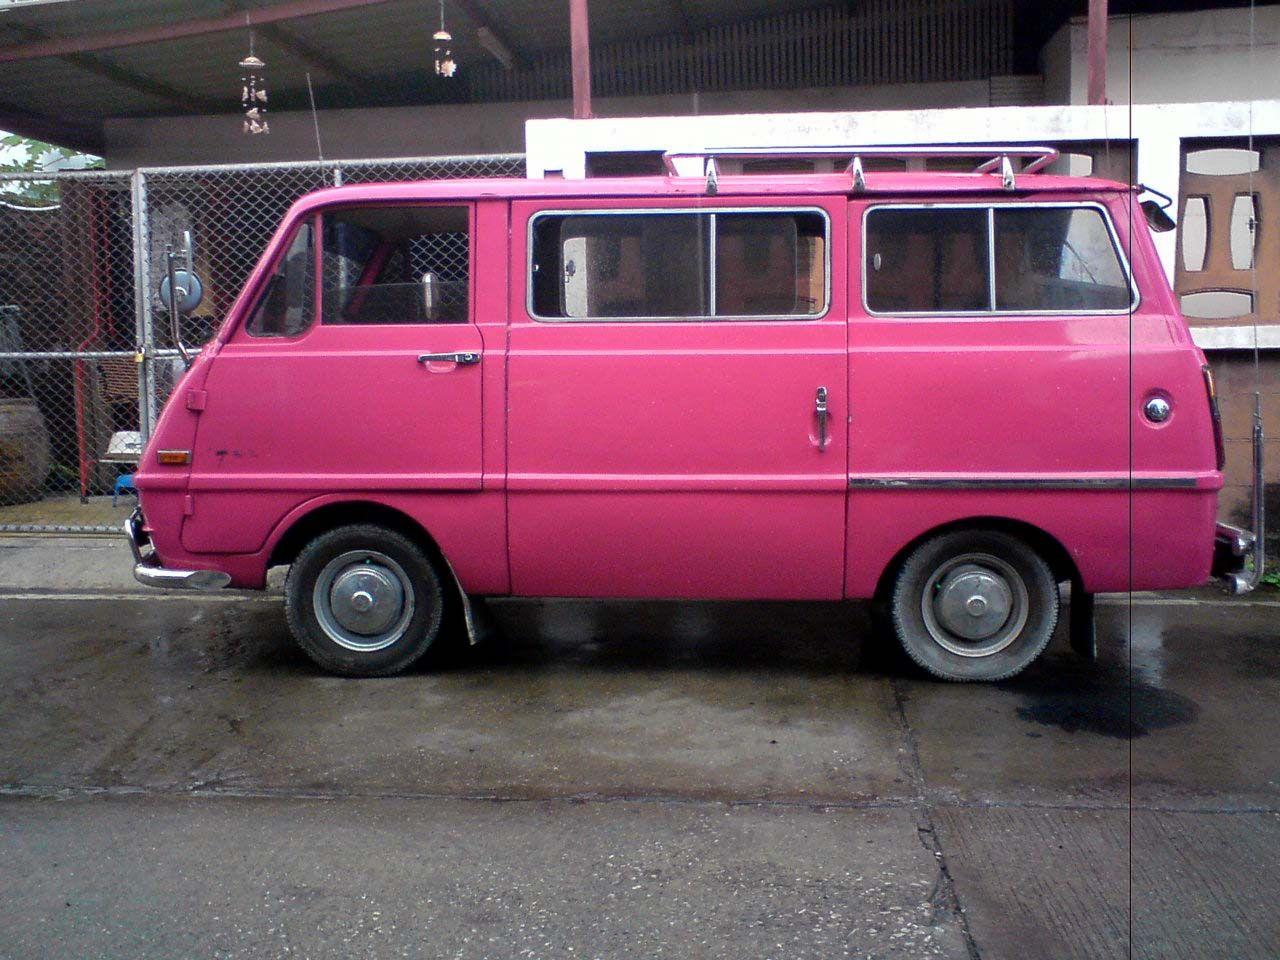 3a7149b2f7 classic Mazda Bongo  pink  van  bus  camper  roadtrip  wanderlust ...